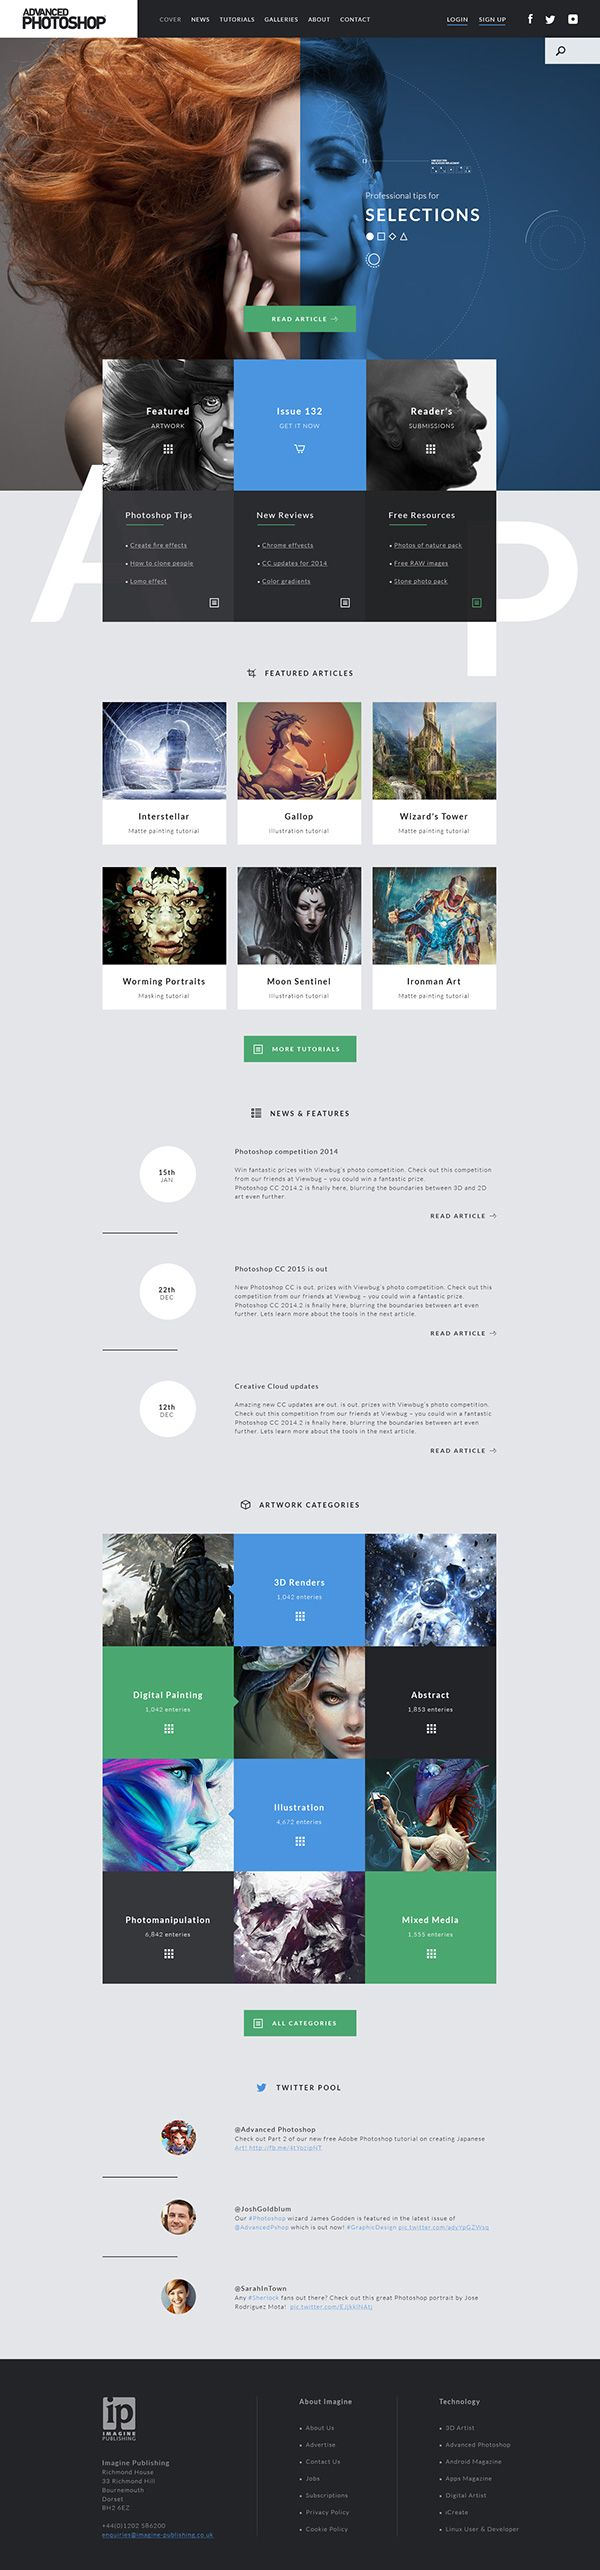 Advanced Photoshop UI/UX, Web Design